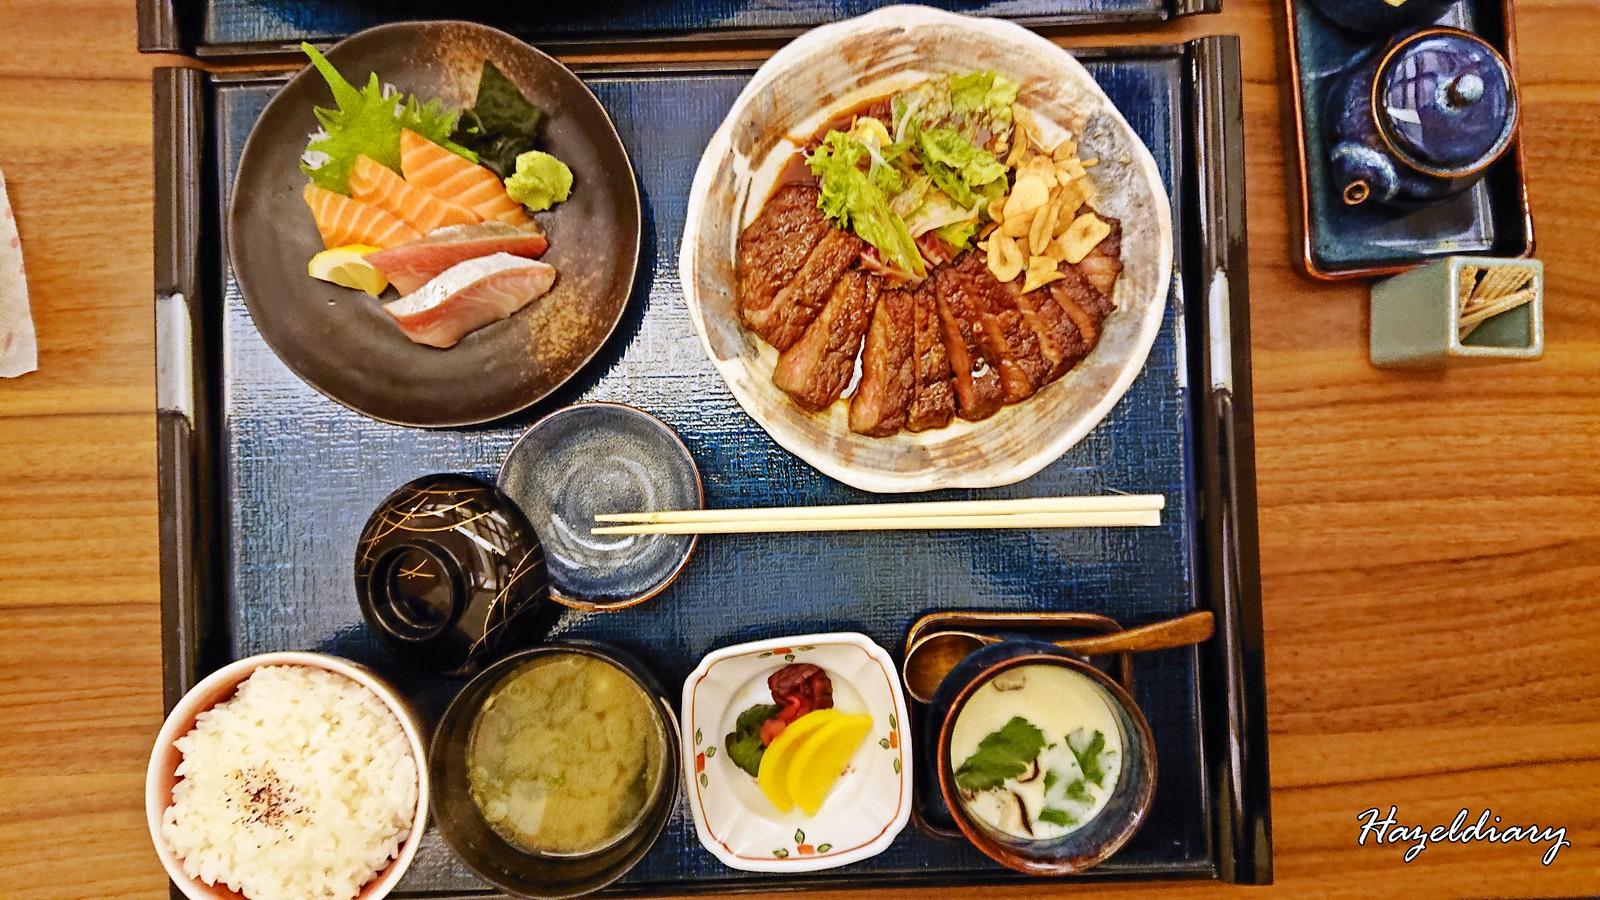 Mitsu Spring Menu-Wagyu Beef Steak Set